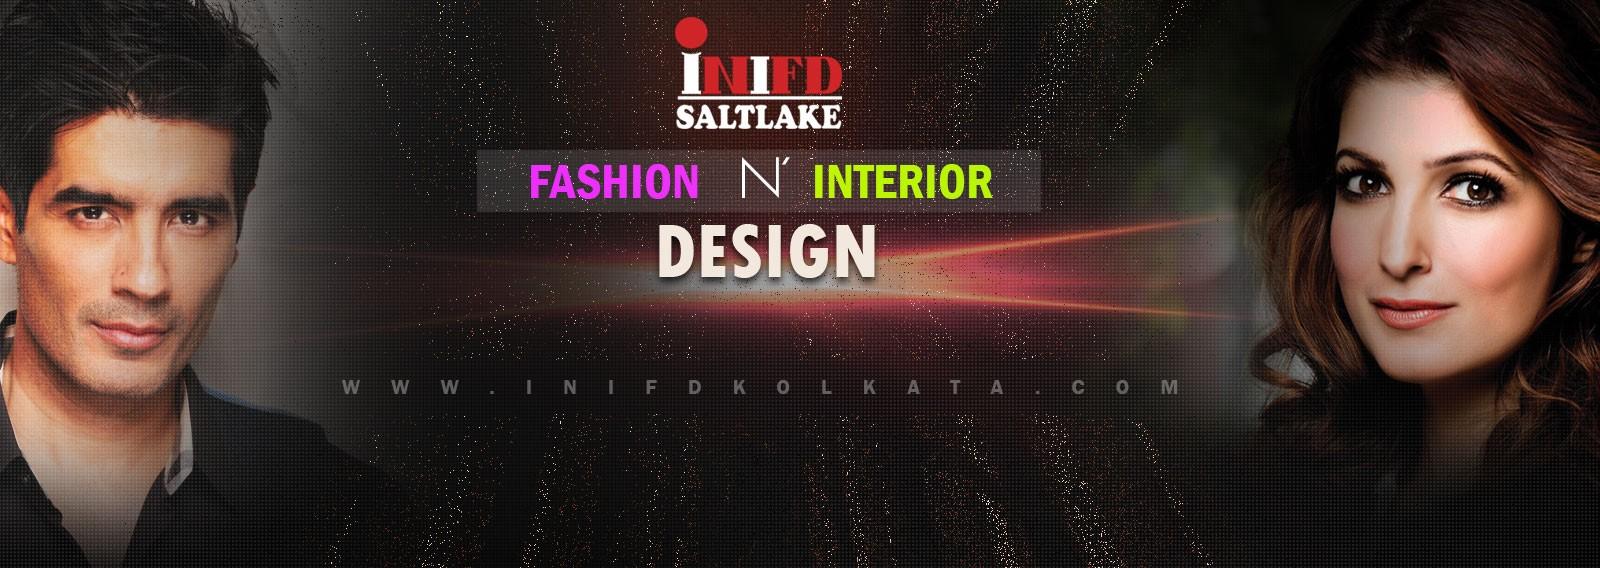 Inifd Saltlake Kolkata Linkedin